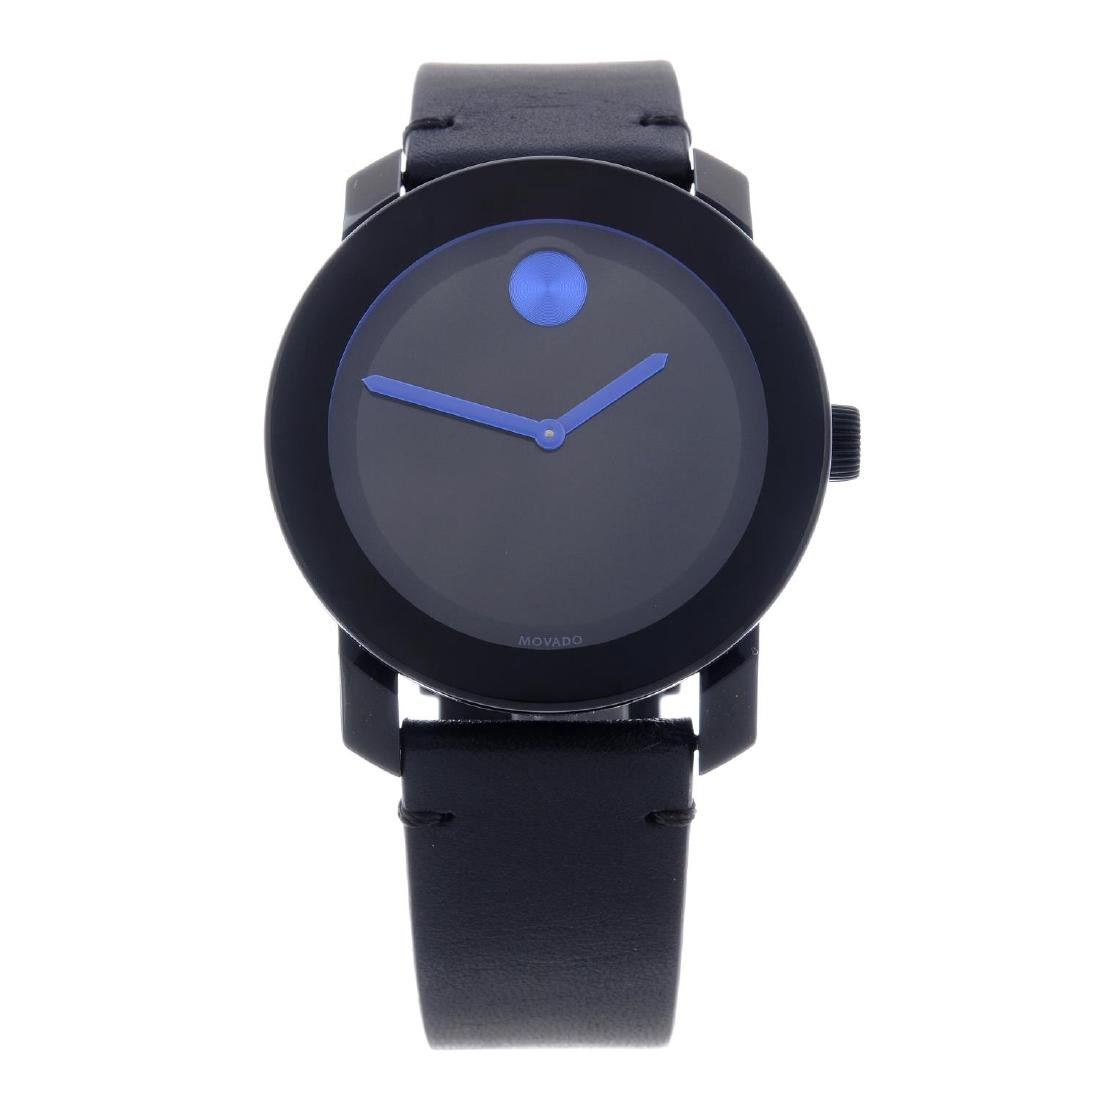 MOVADO - a gentleman's Bold wrist watch. Plastic case